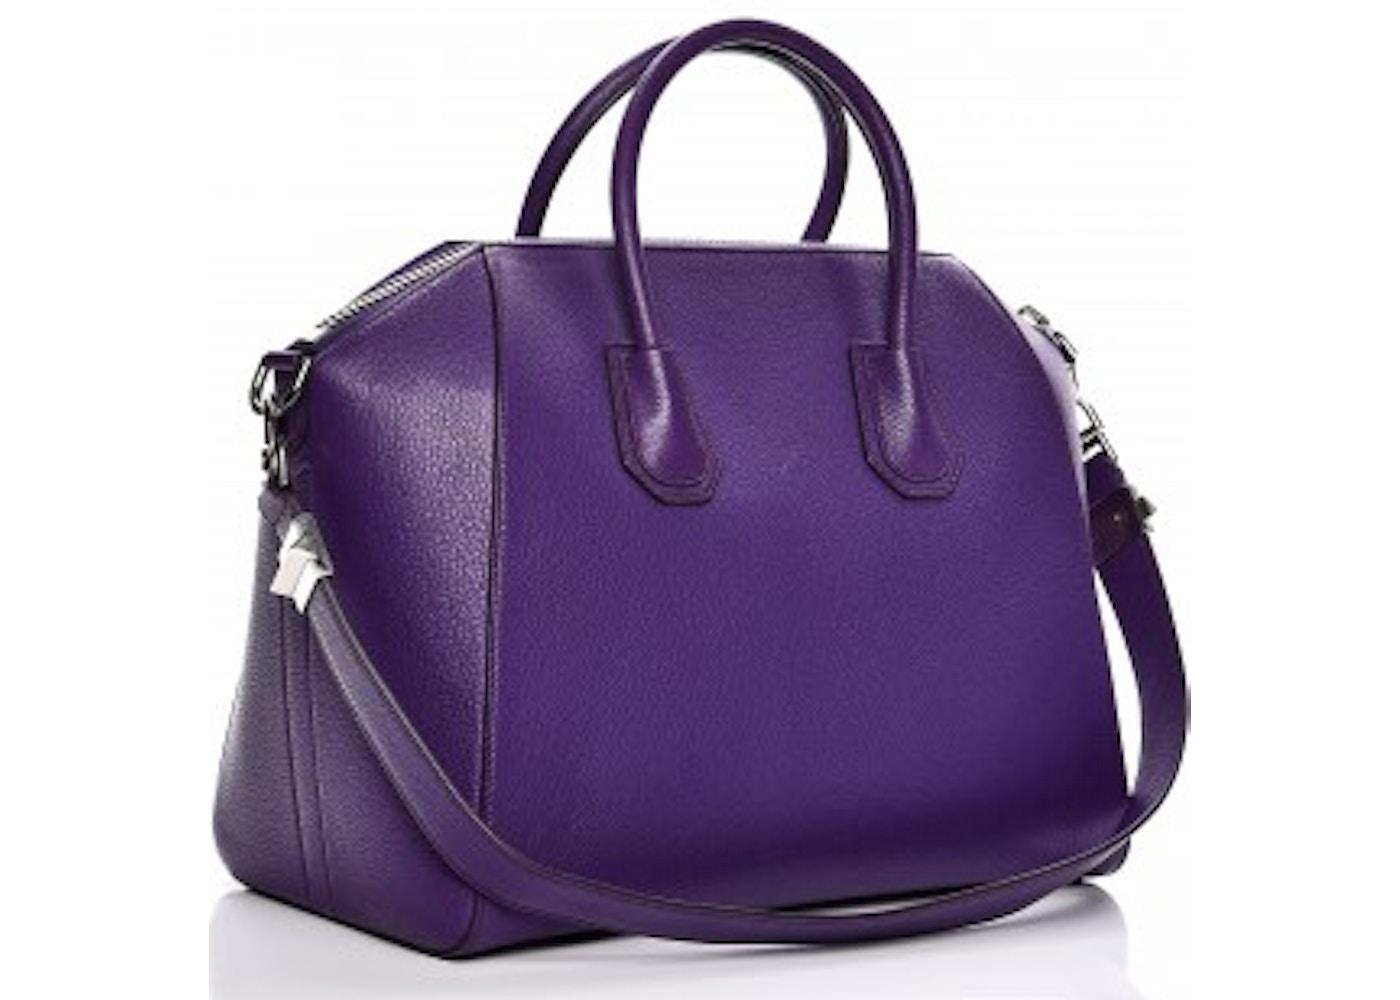 Givenchy Antigona Tote Sugar Goatskin Medium Purple 5f3196c15aabb